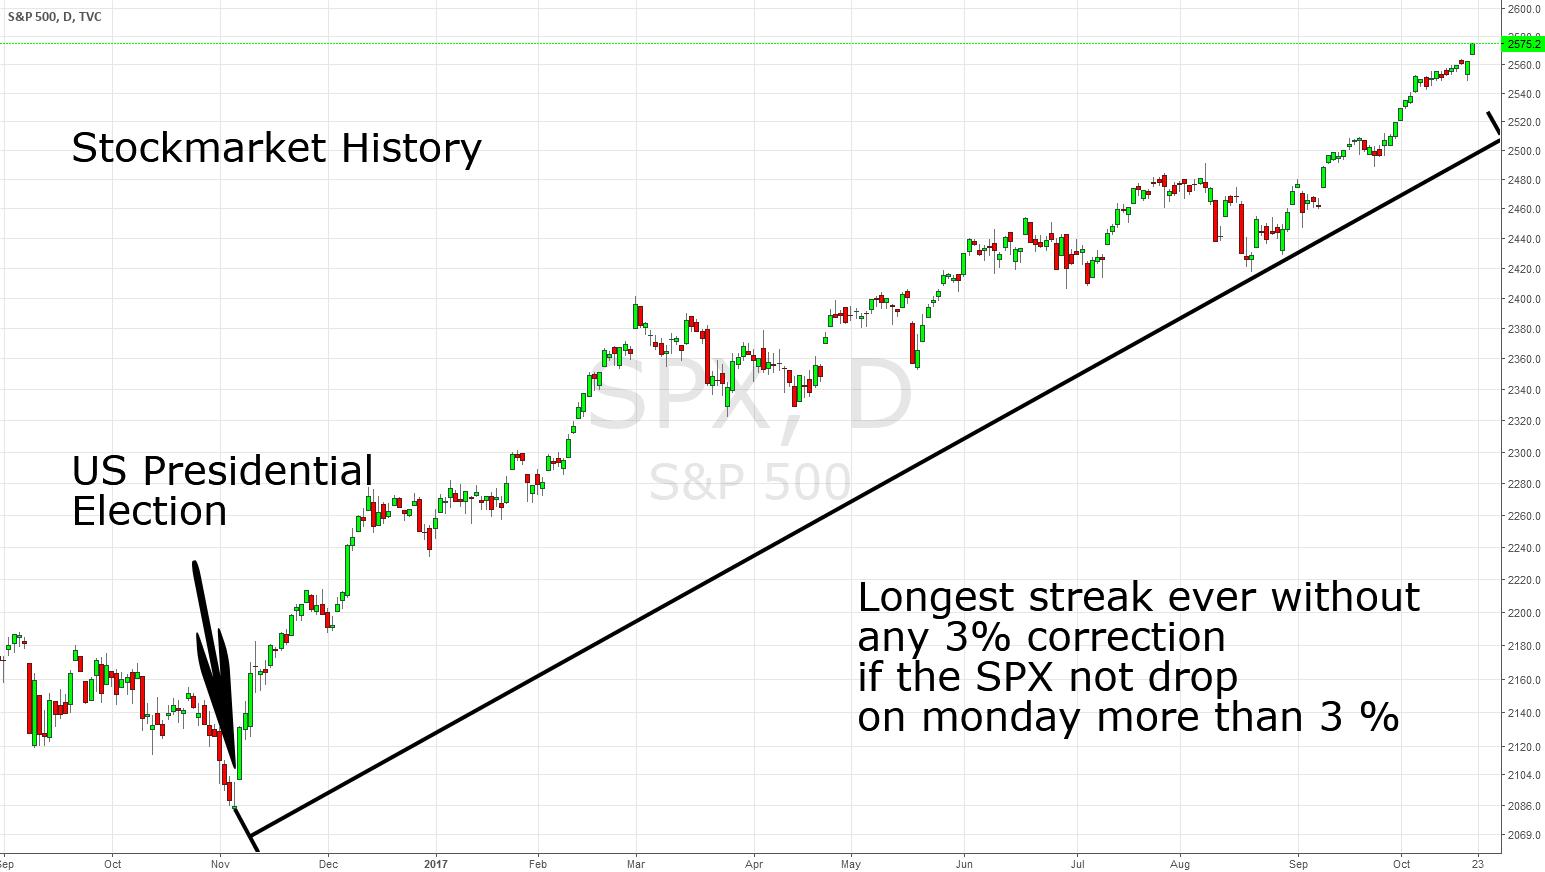 Stockmarket History: Longest streak without 3% correction ever